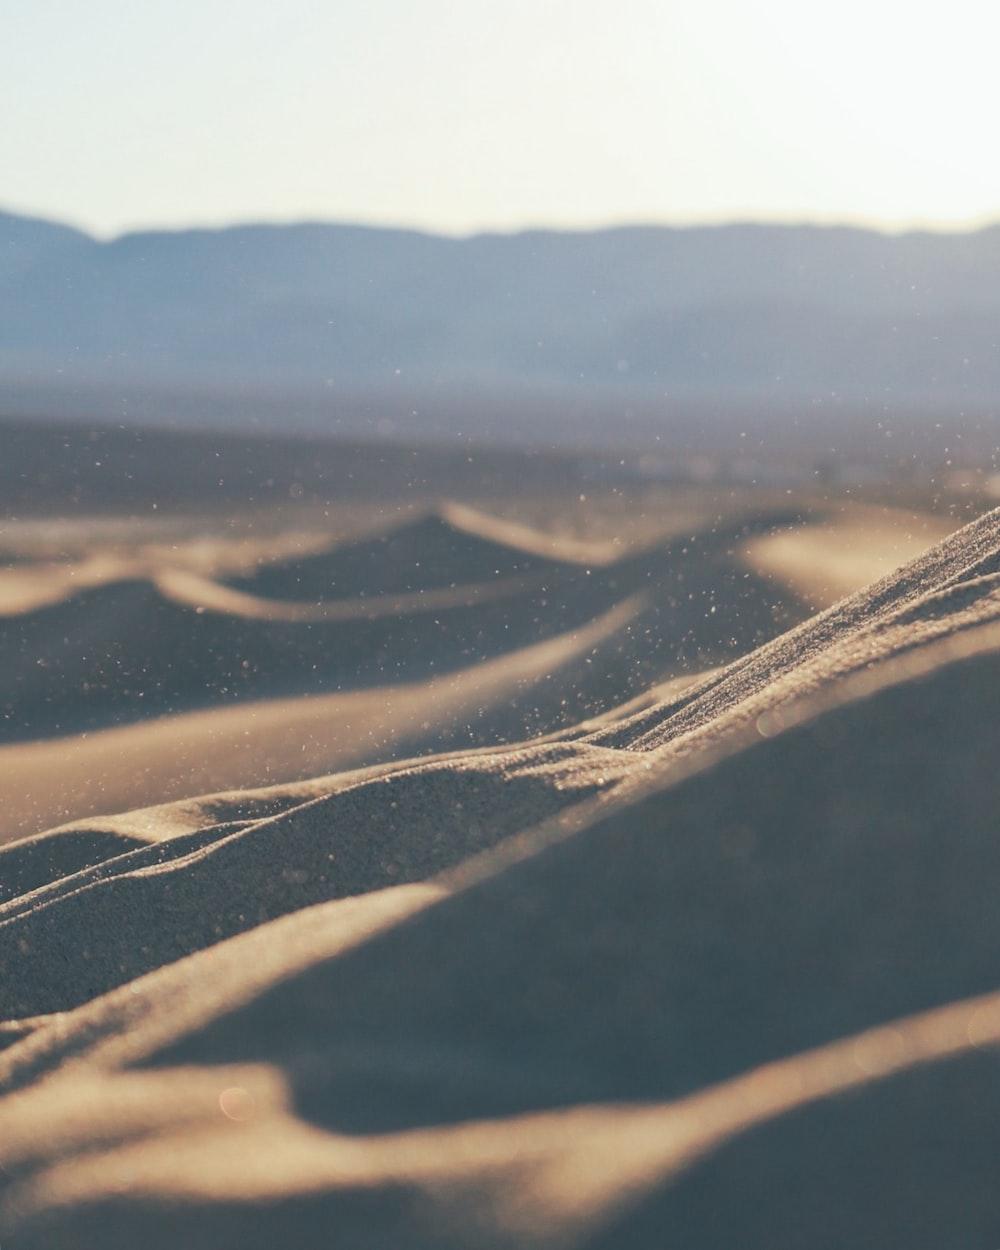 closeup photo of sand dunes during daytime